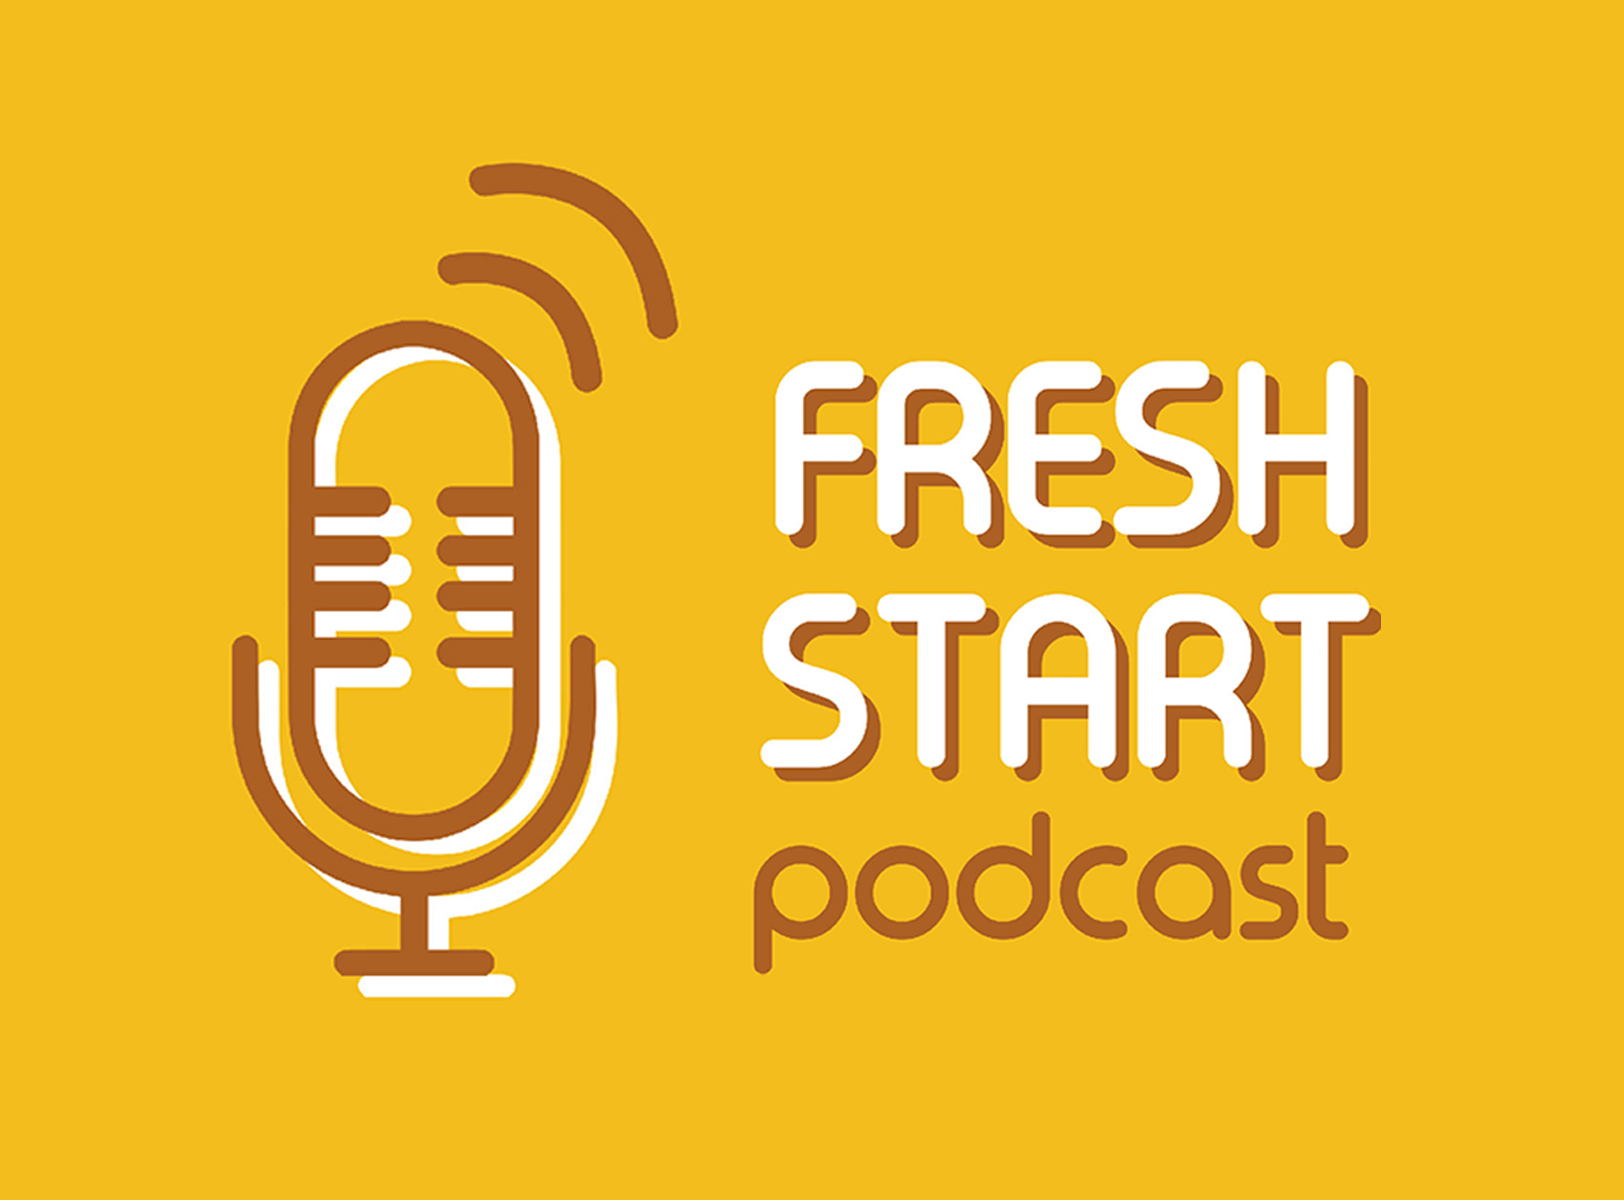 Fresh Start: Podcast News (5/28/2019 Tue.)